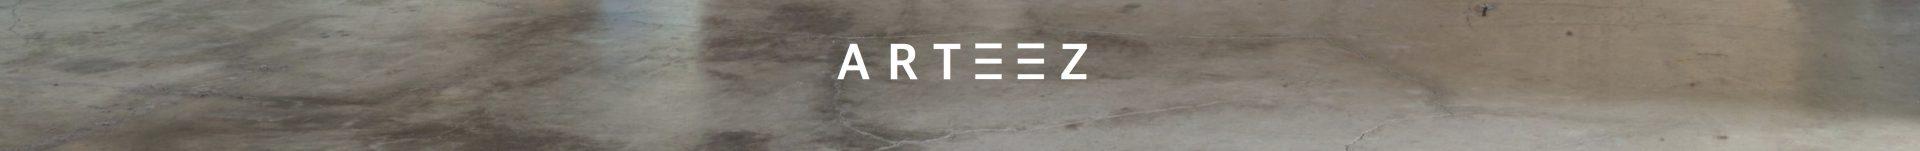 cropped-arteez_logo2.jpg